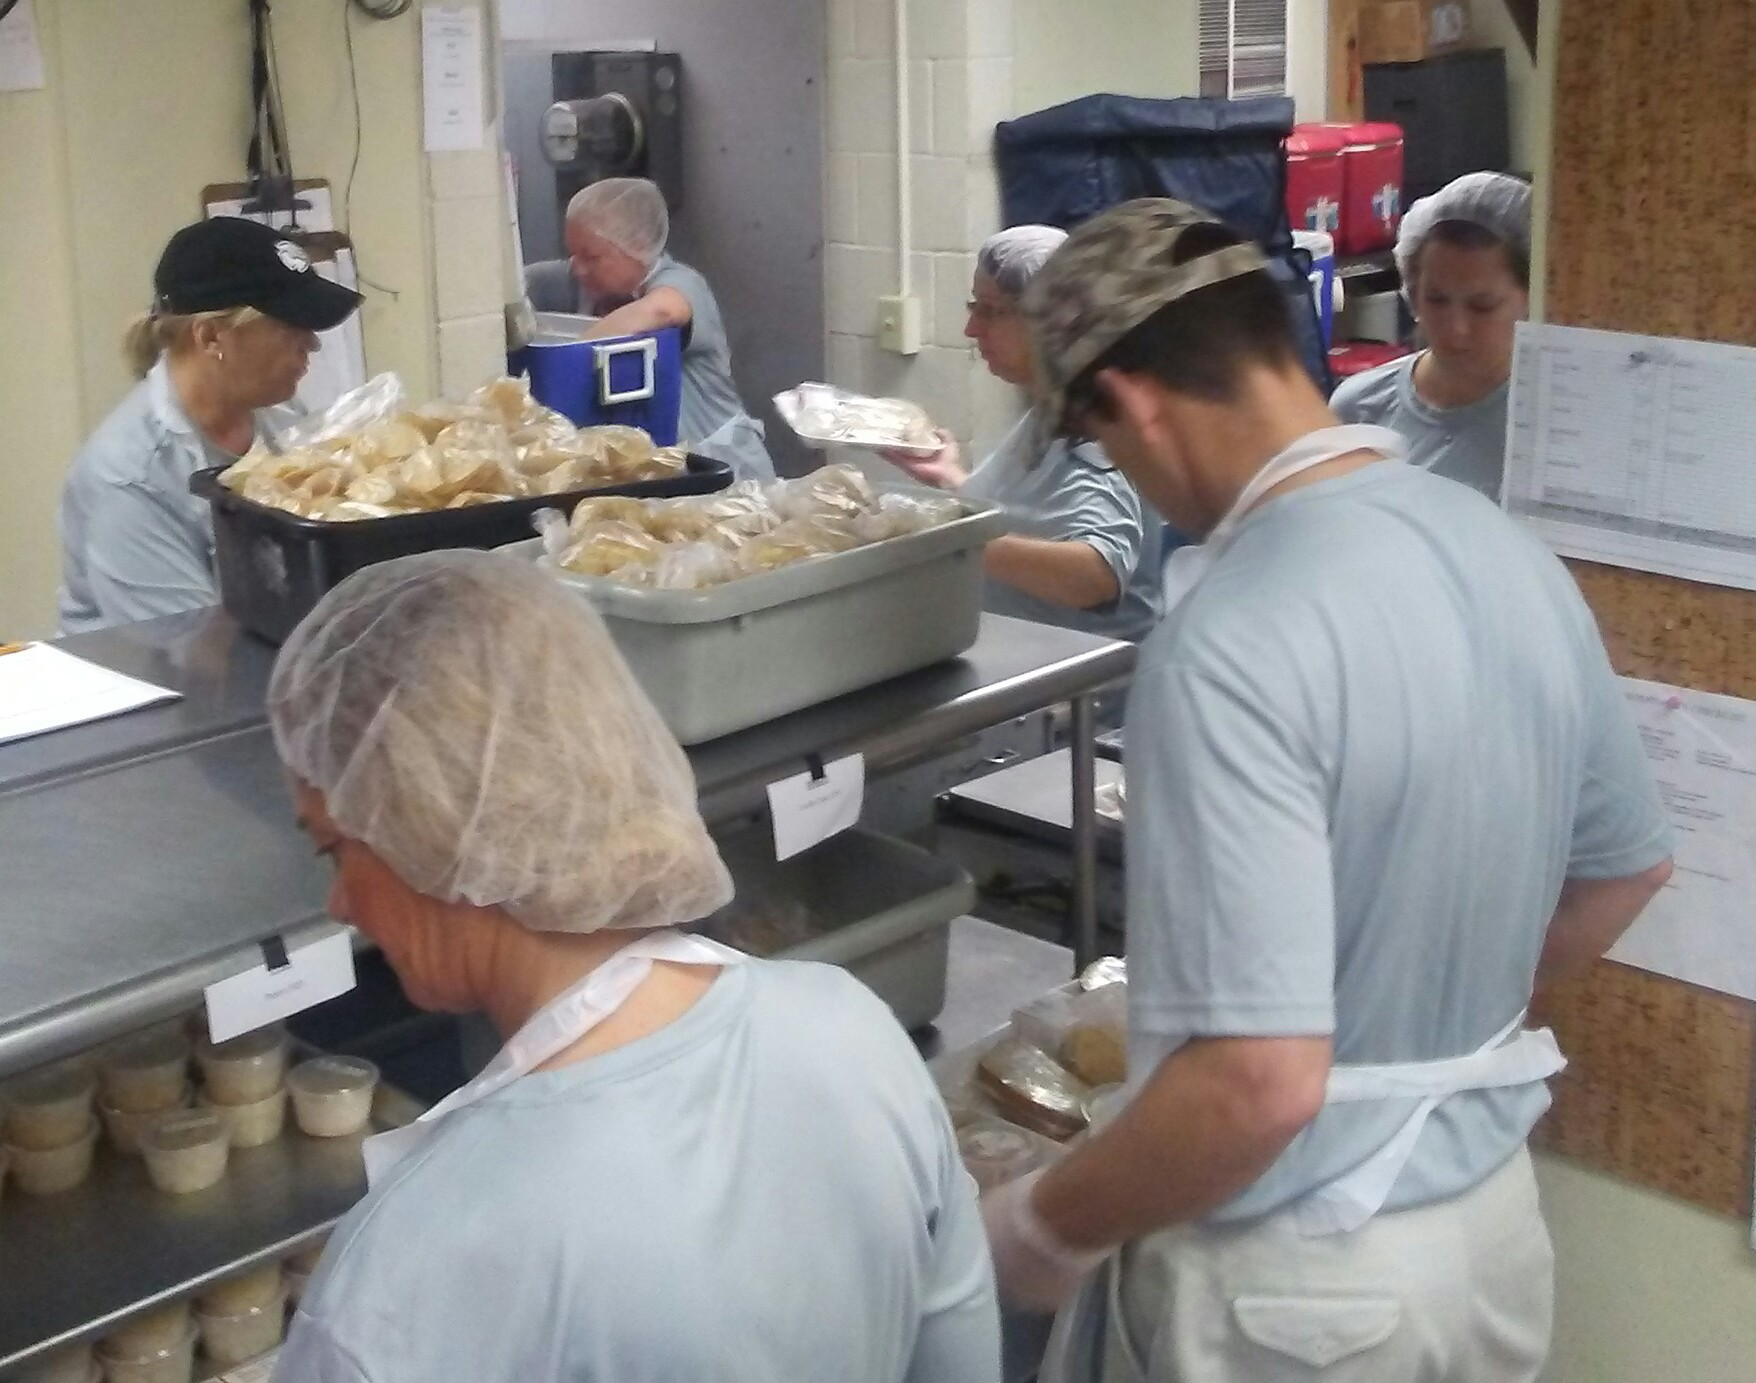 Meals on Wheels of Syracuse welcomes Hancock Estabrook LLP